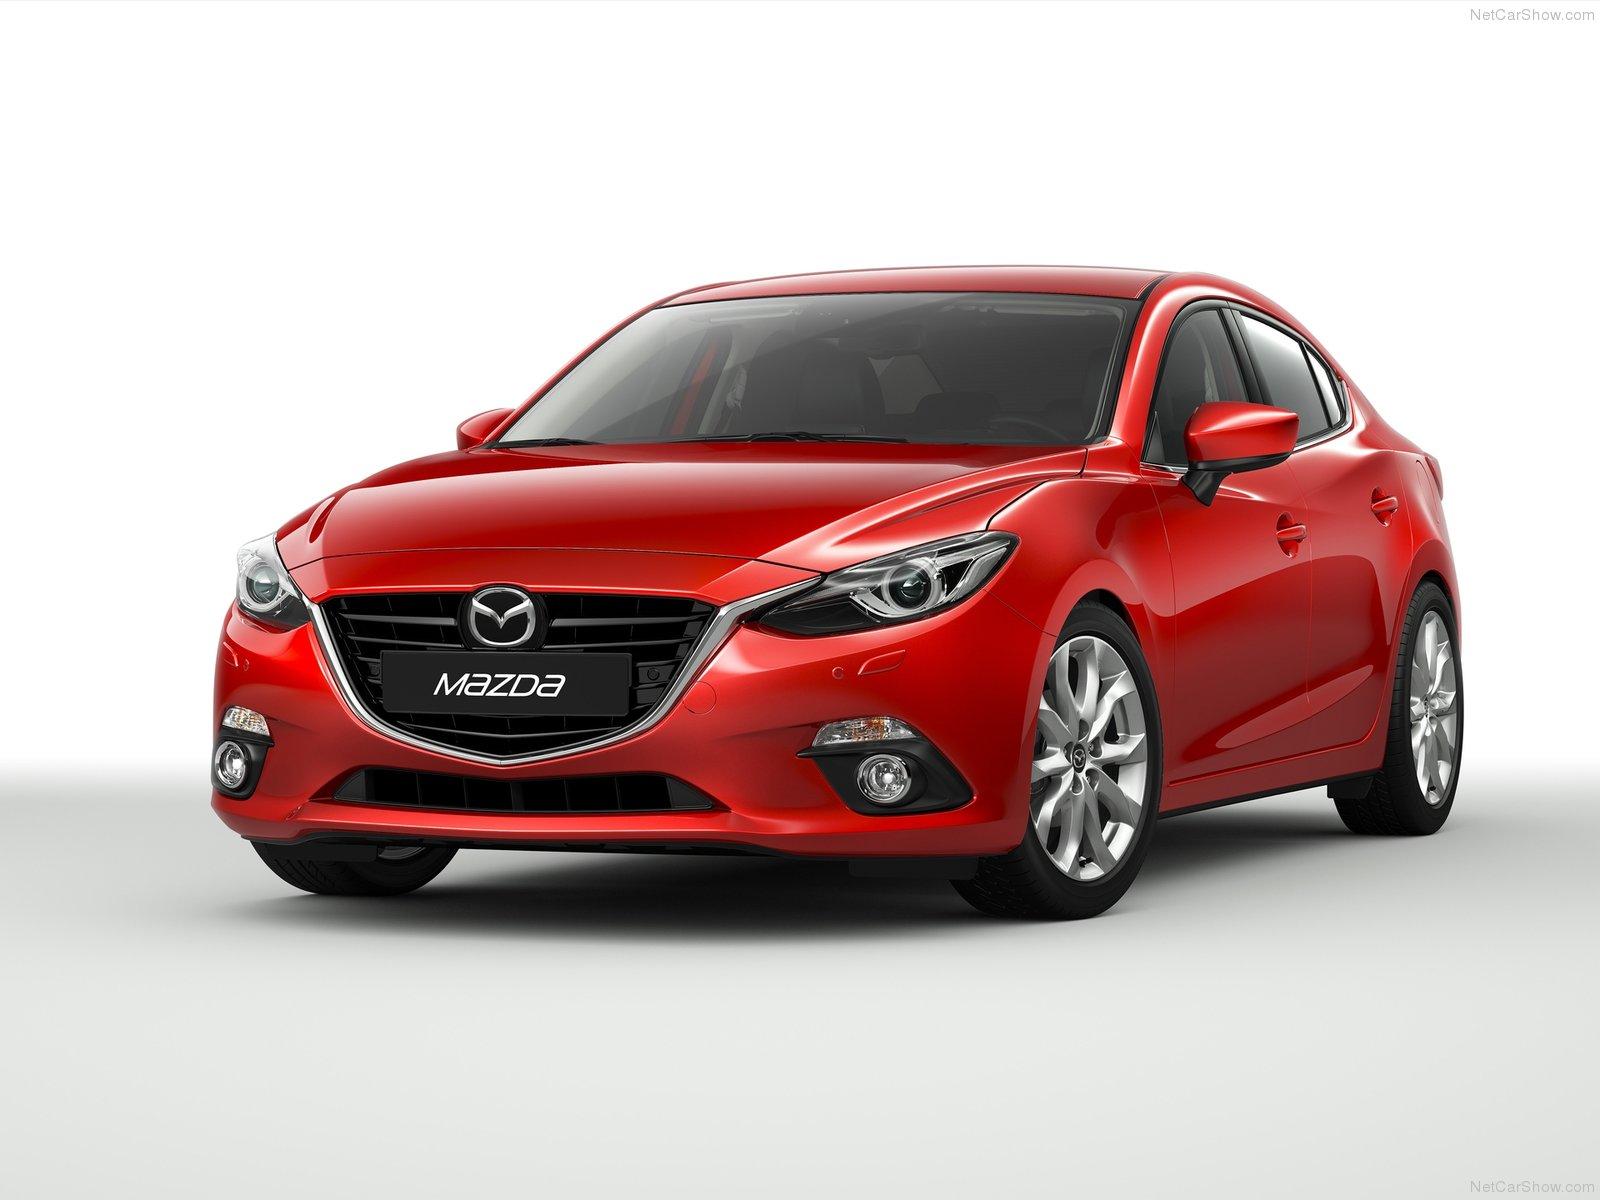 Mazda-3_Sedan_2014_1600x1200_wallpaper_38.jpg